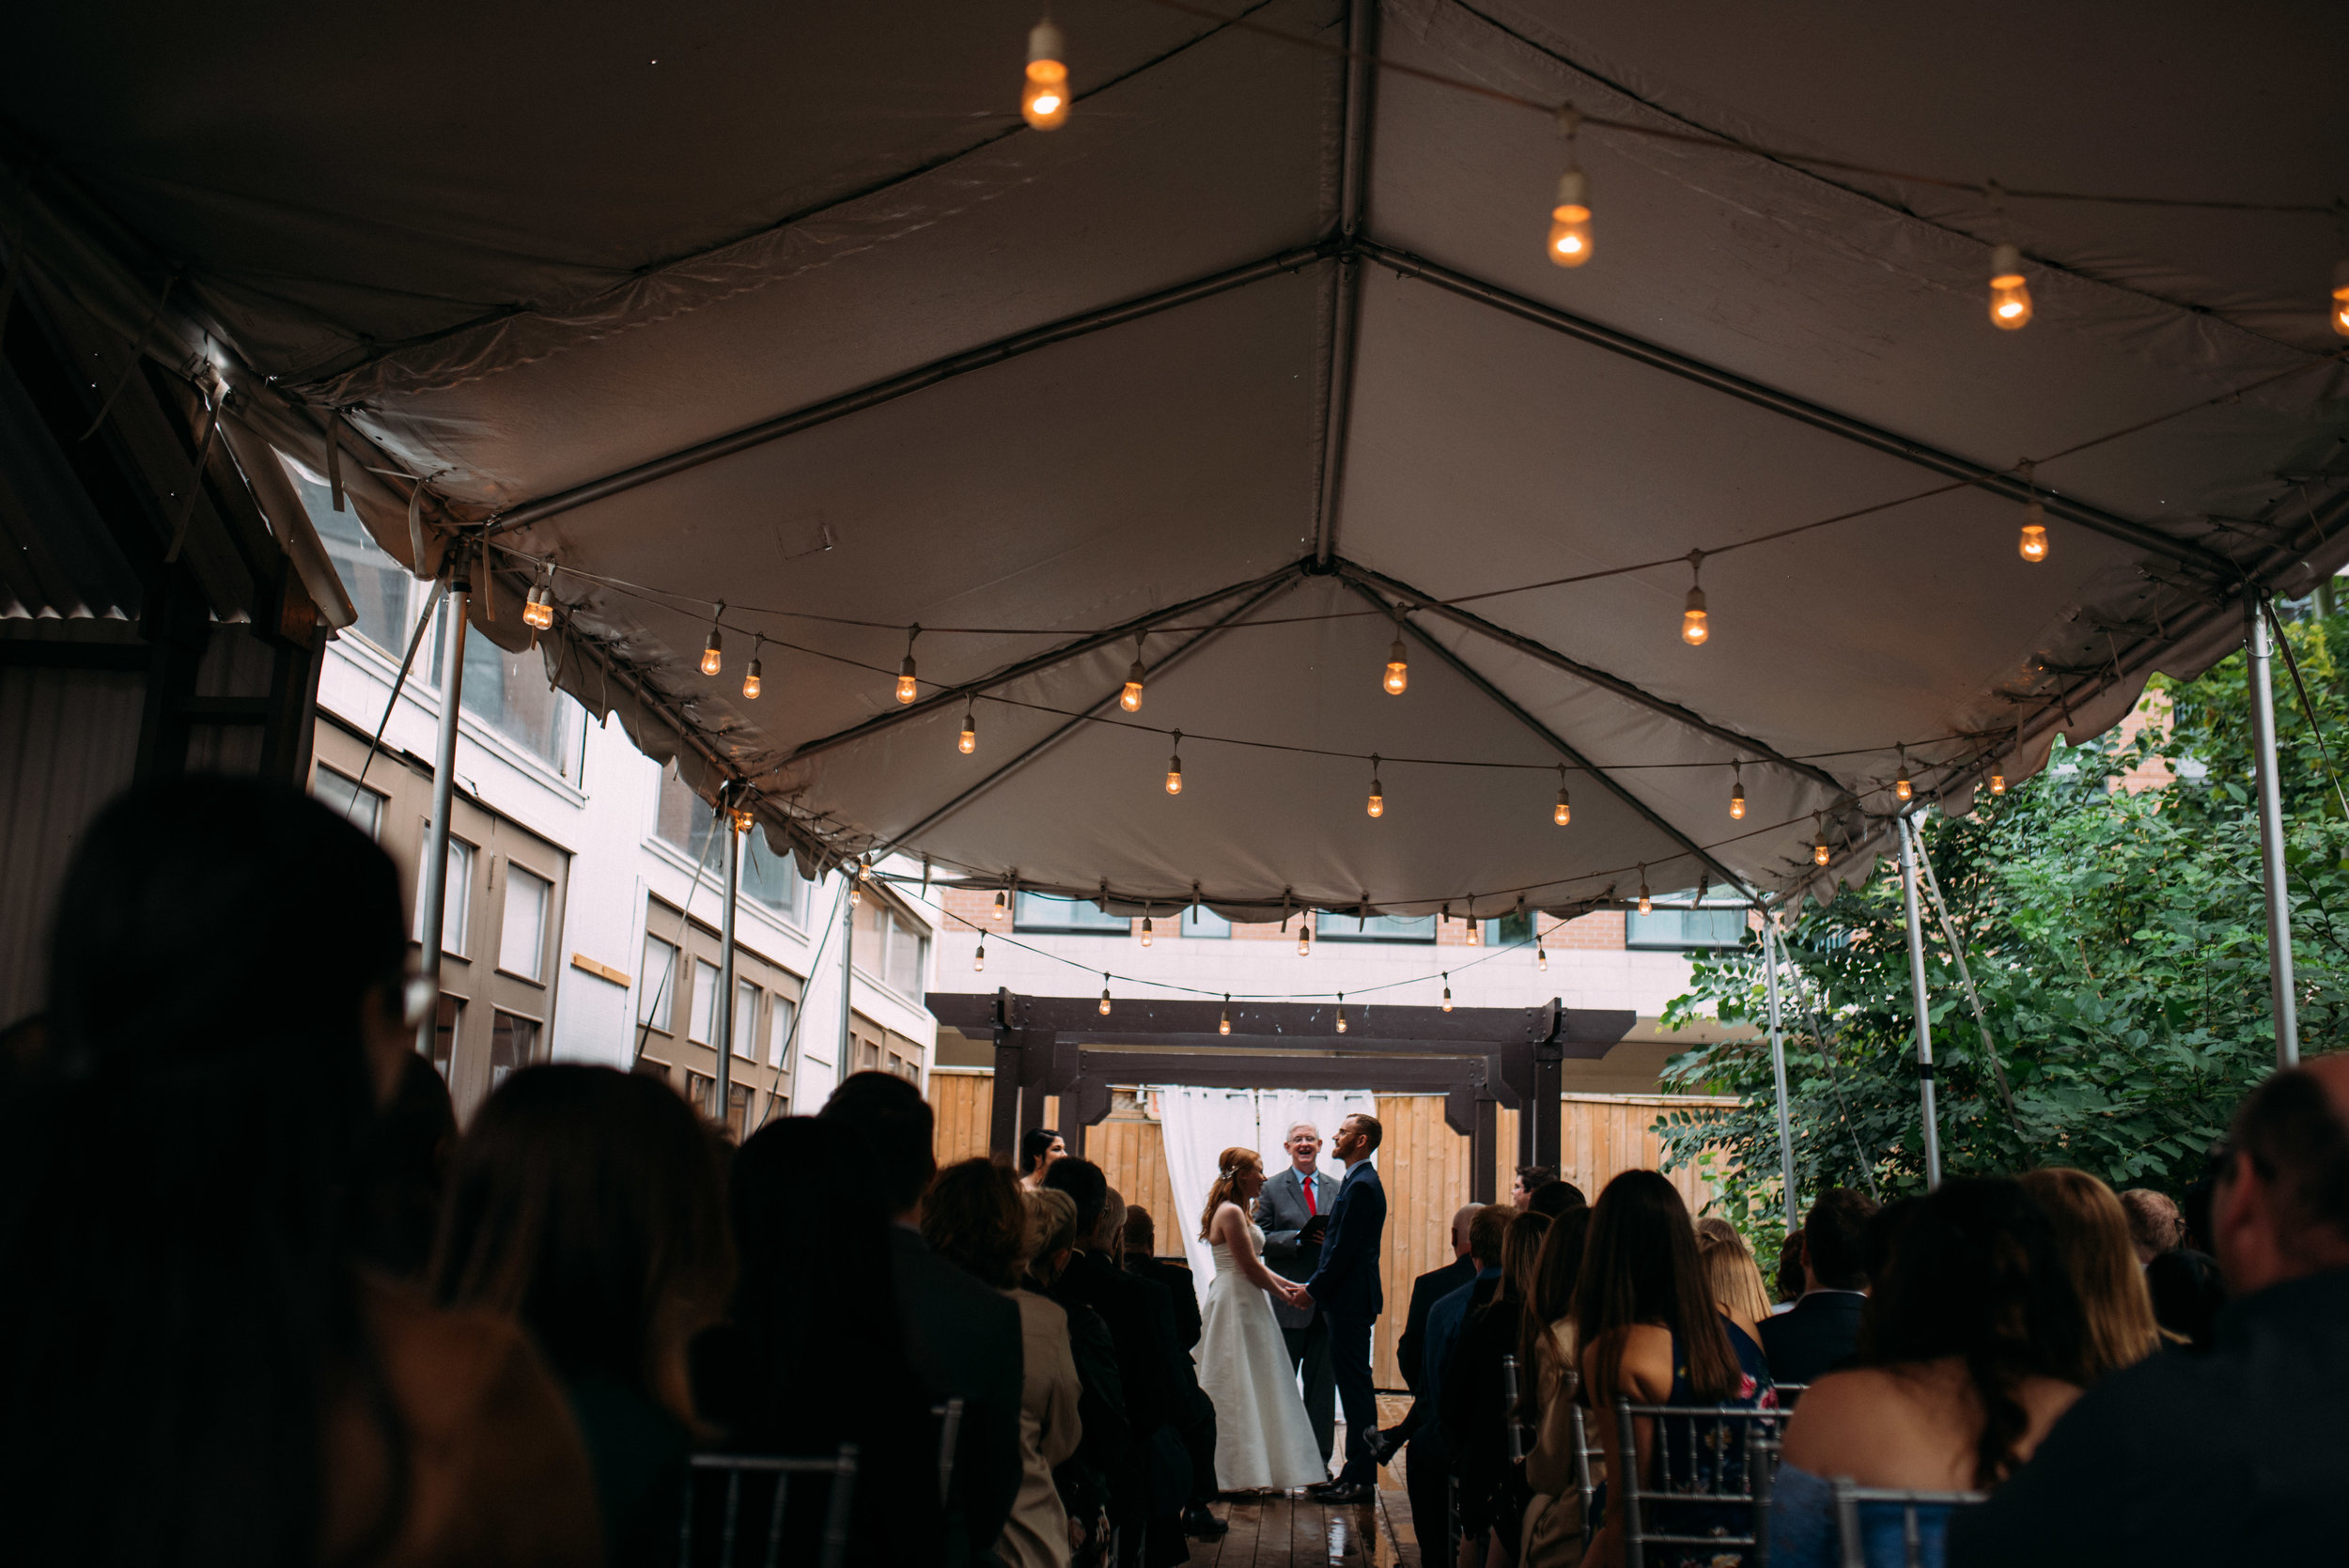 Toronto Wedding Photography at Berkeley Fieldhouse with soundslikeyellowphotography